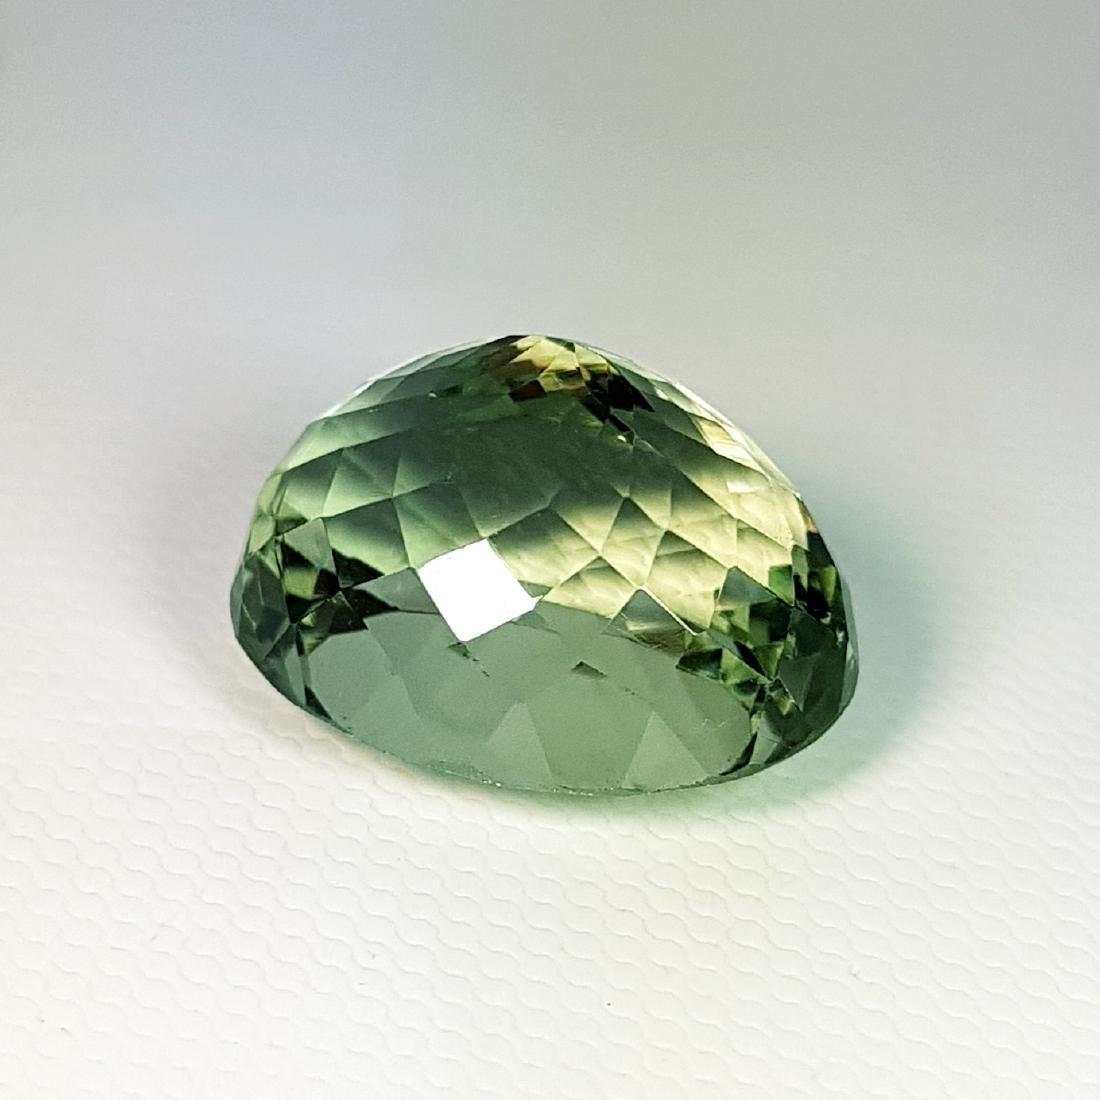 Green Amethyst - 19.22 ct - 3